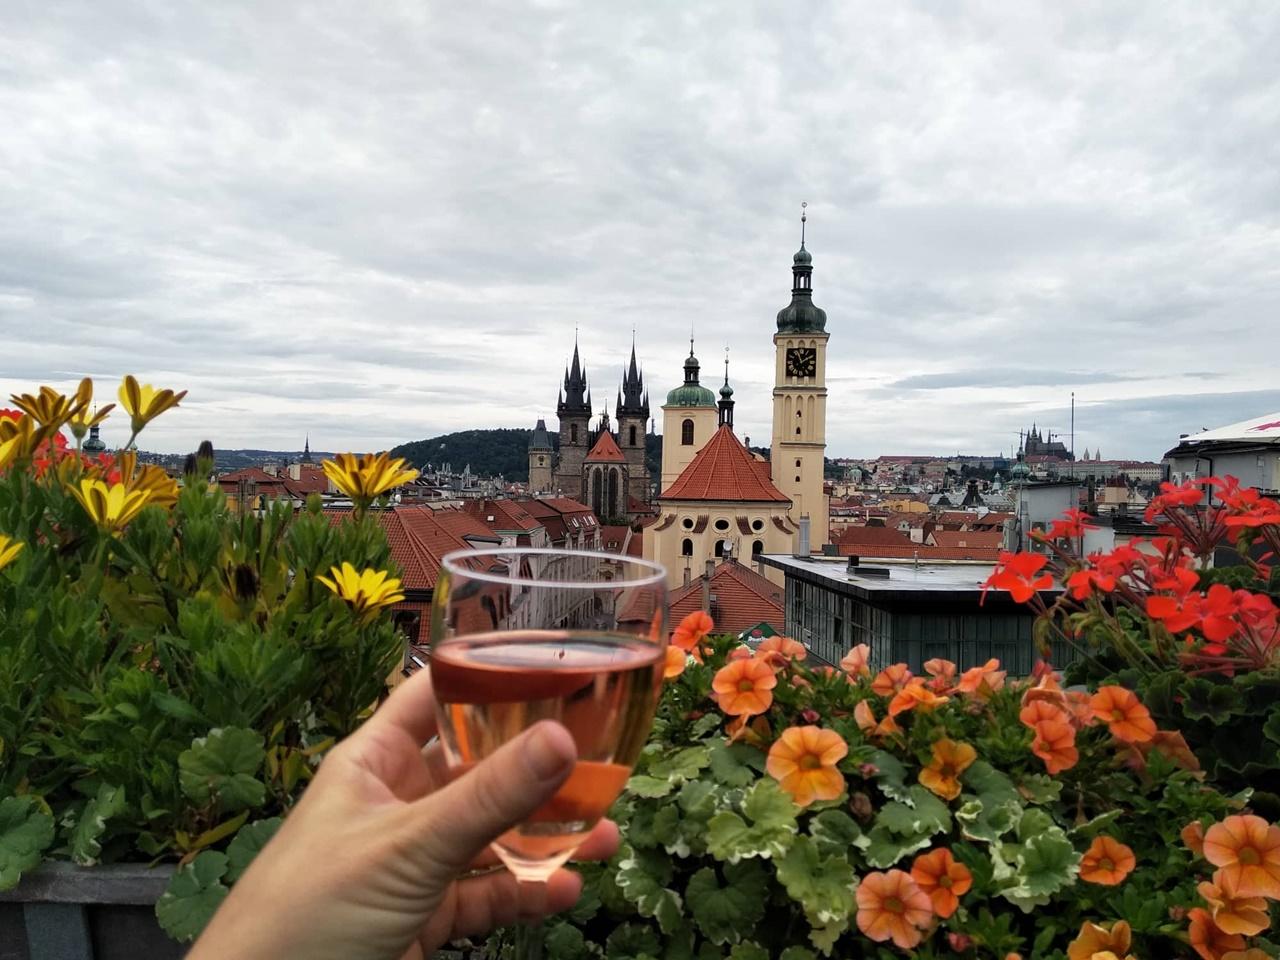 Kocsmázva utazni utazva kocsmázni - Dancsa Timi Prága